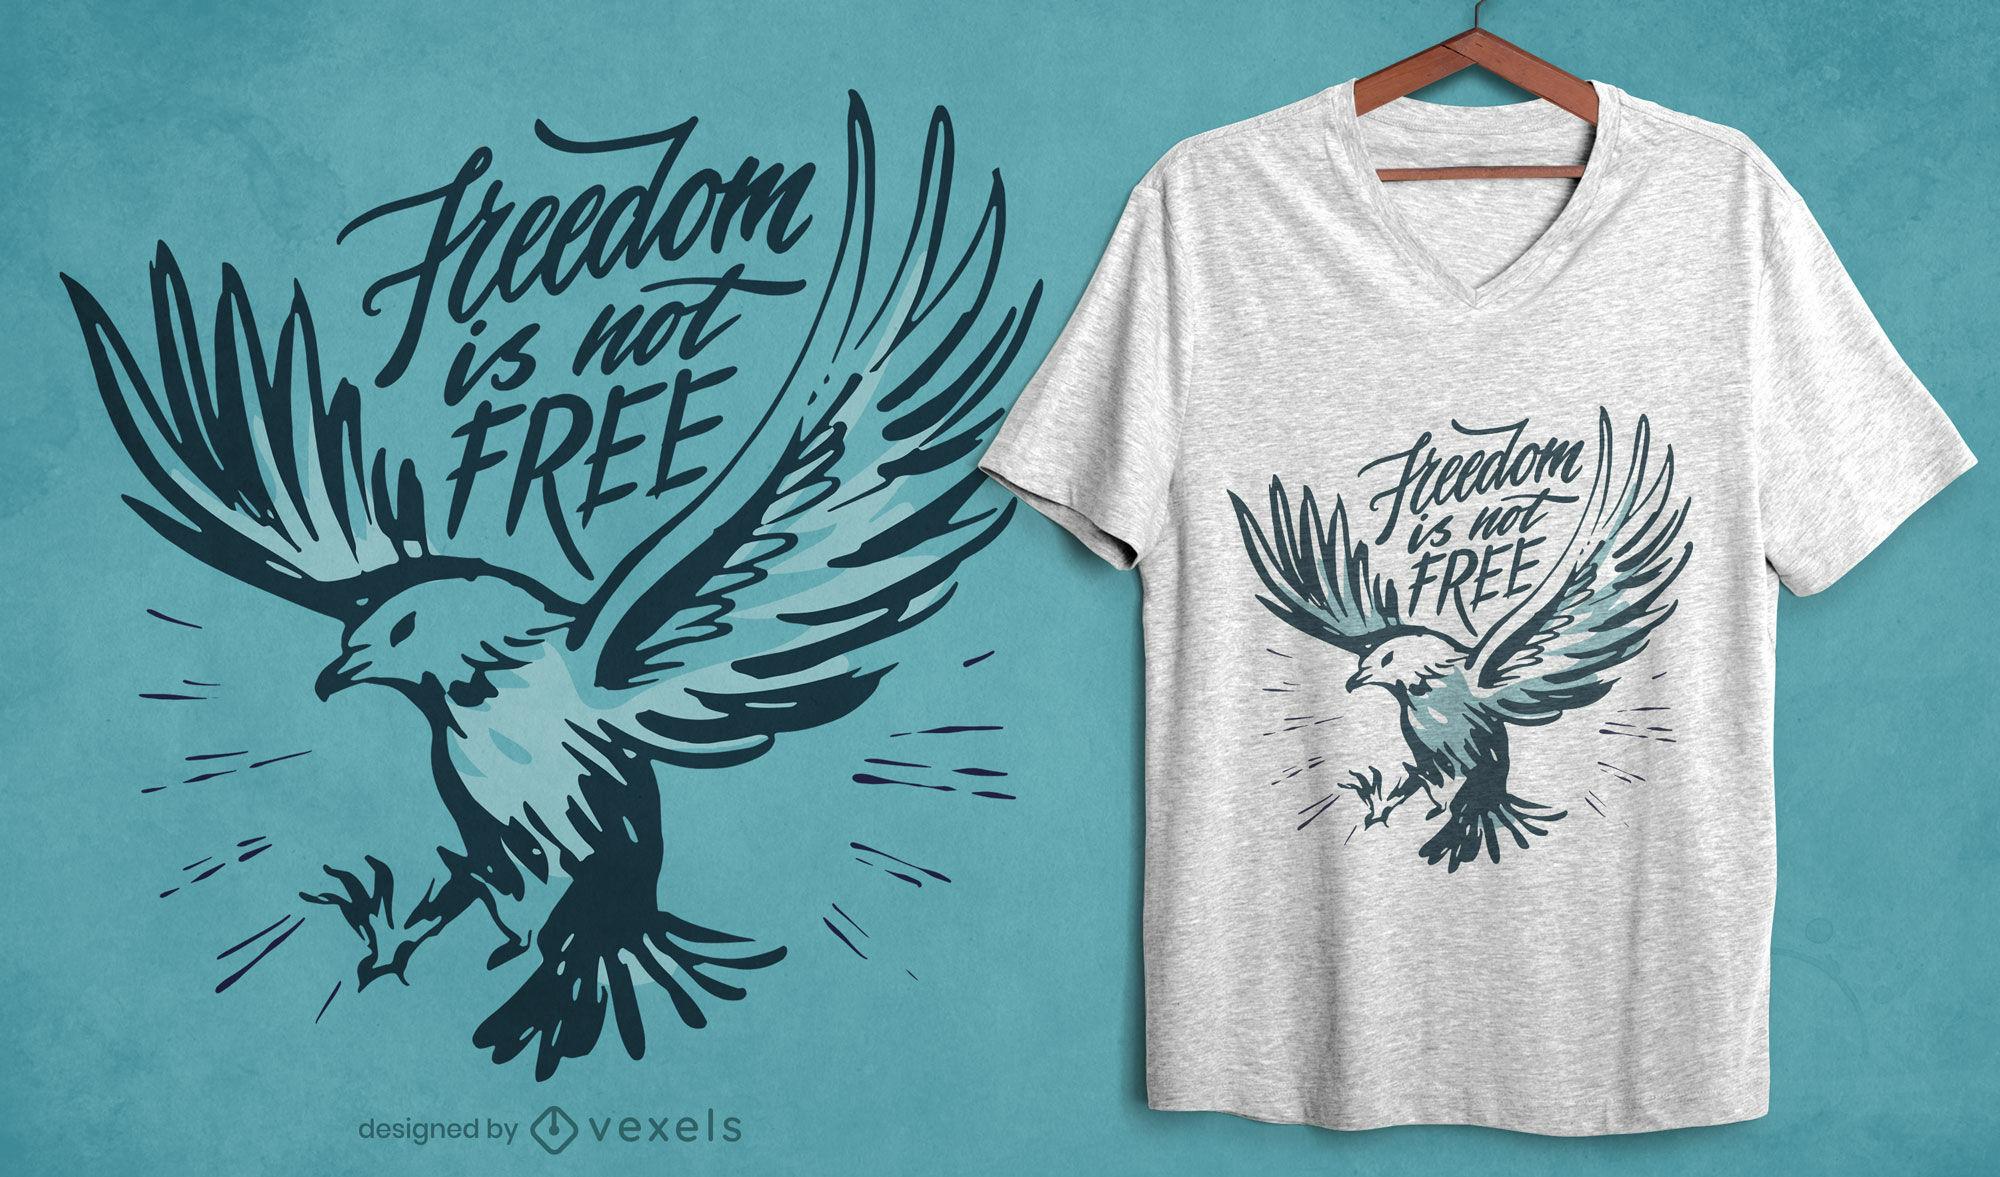 Freiheitsadler-T-Shirt-Design